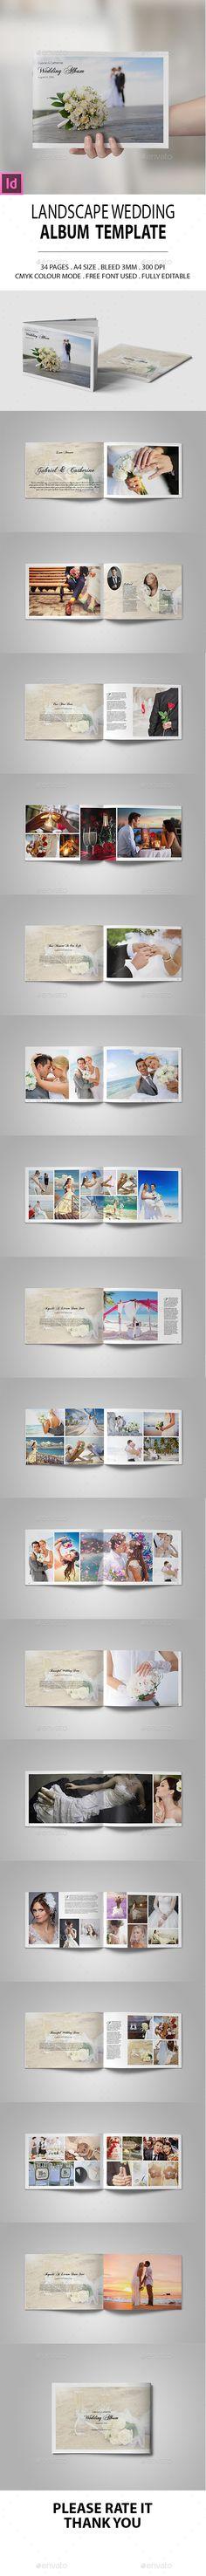 312 best Photo Album Templates images on Pinterest